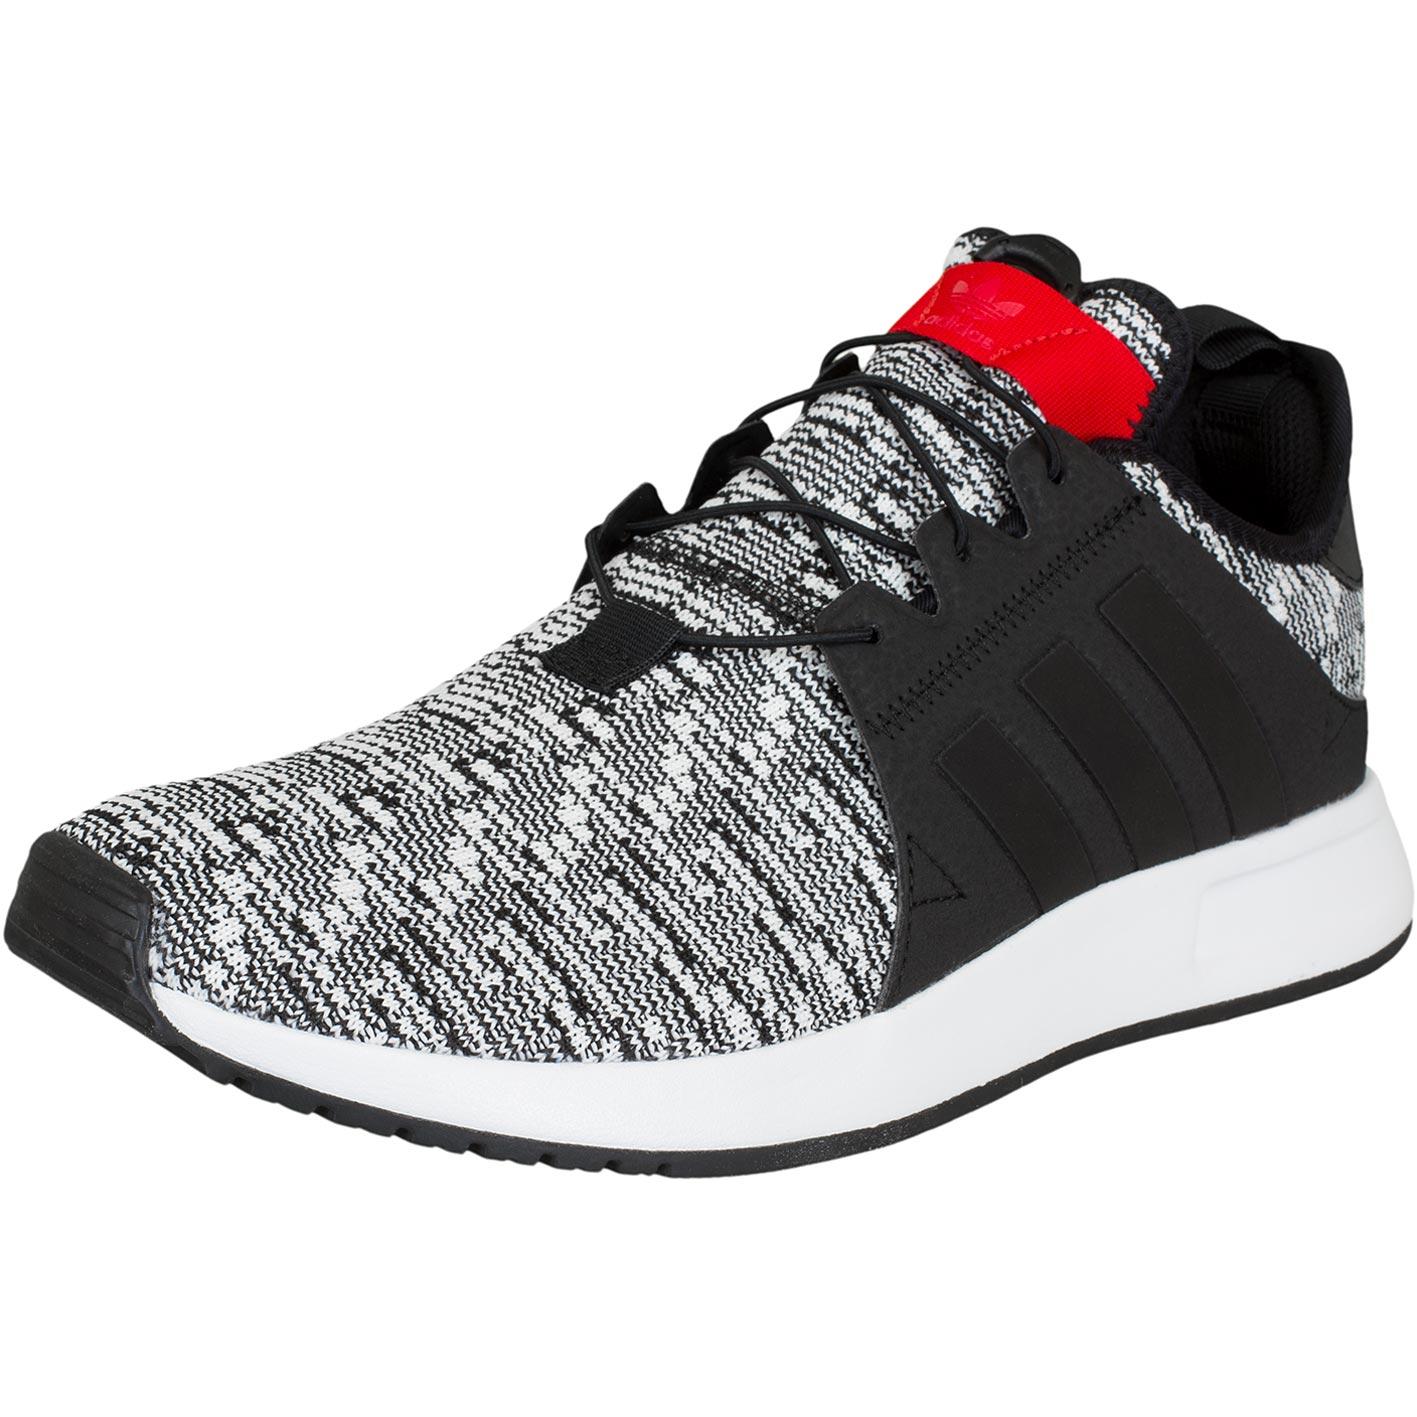 62fcbb5360 ☆ Adidas Originals Sneaker X PLR schwarz/schwarz/rot - hier bestellen!